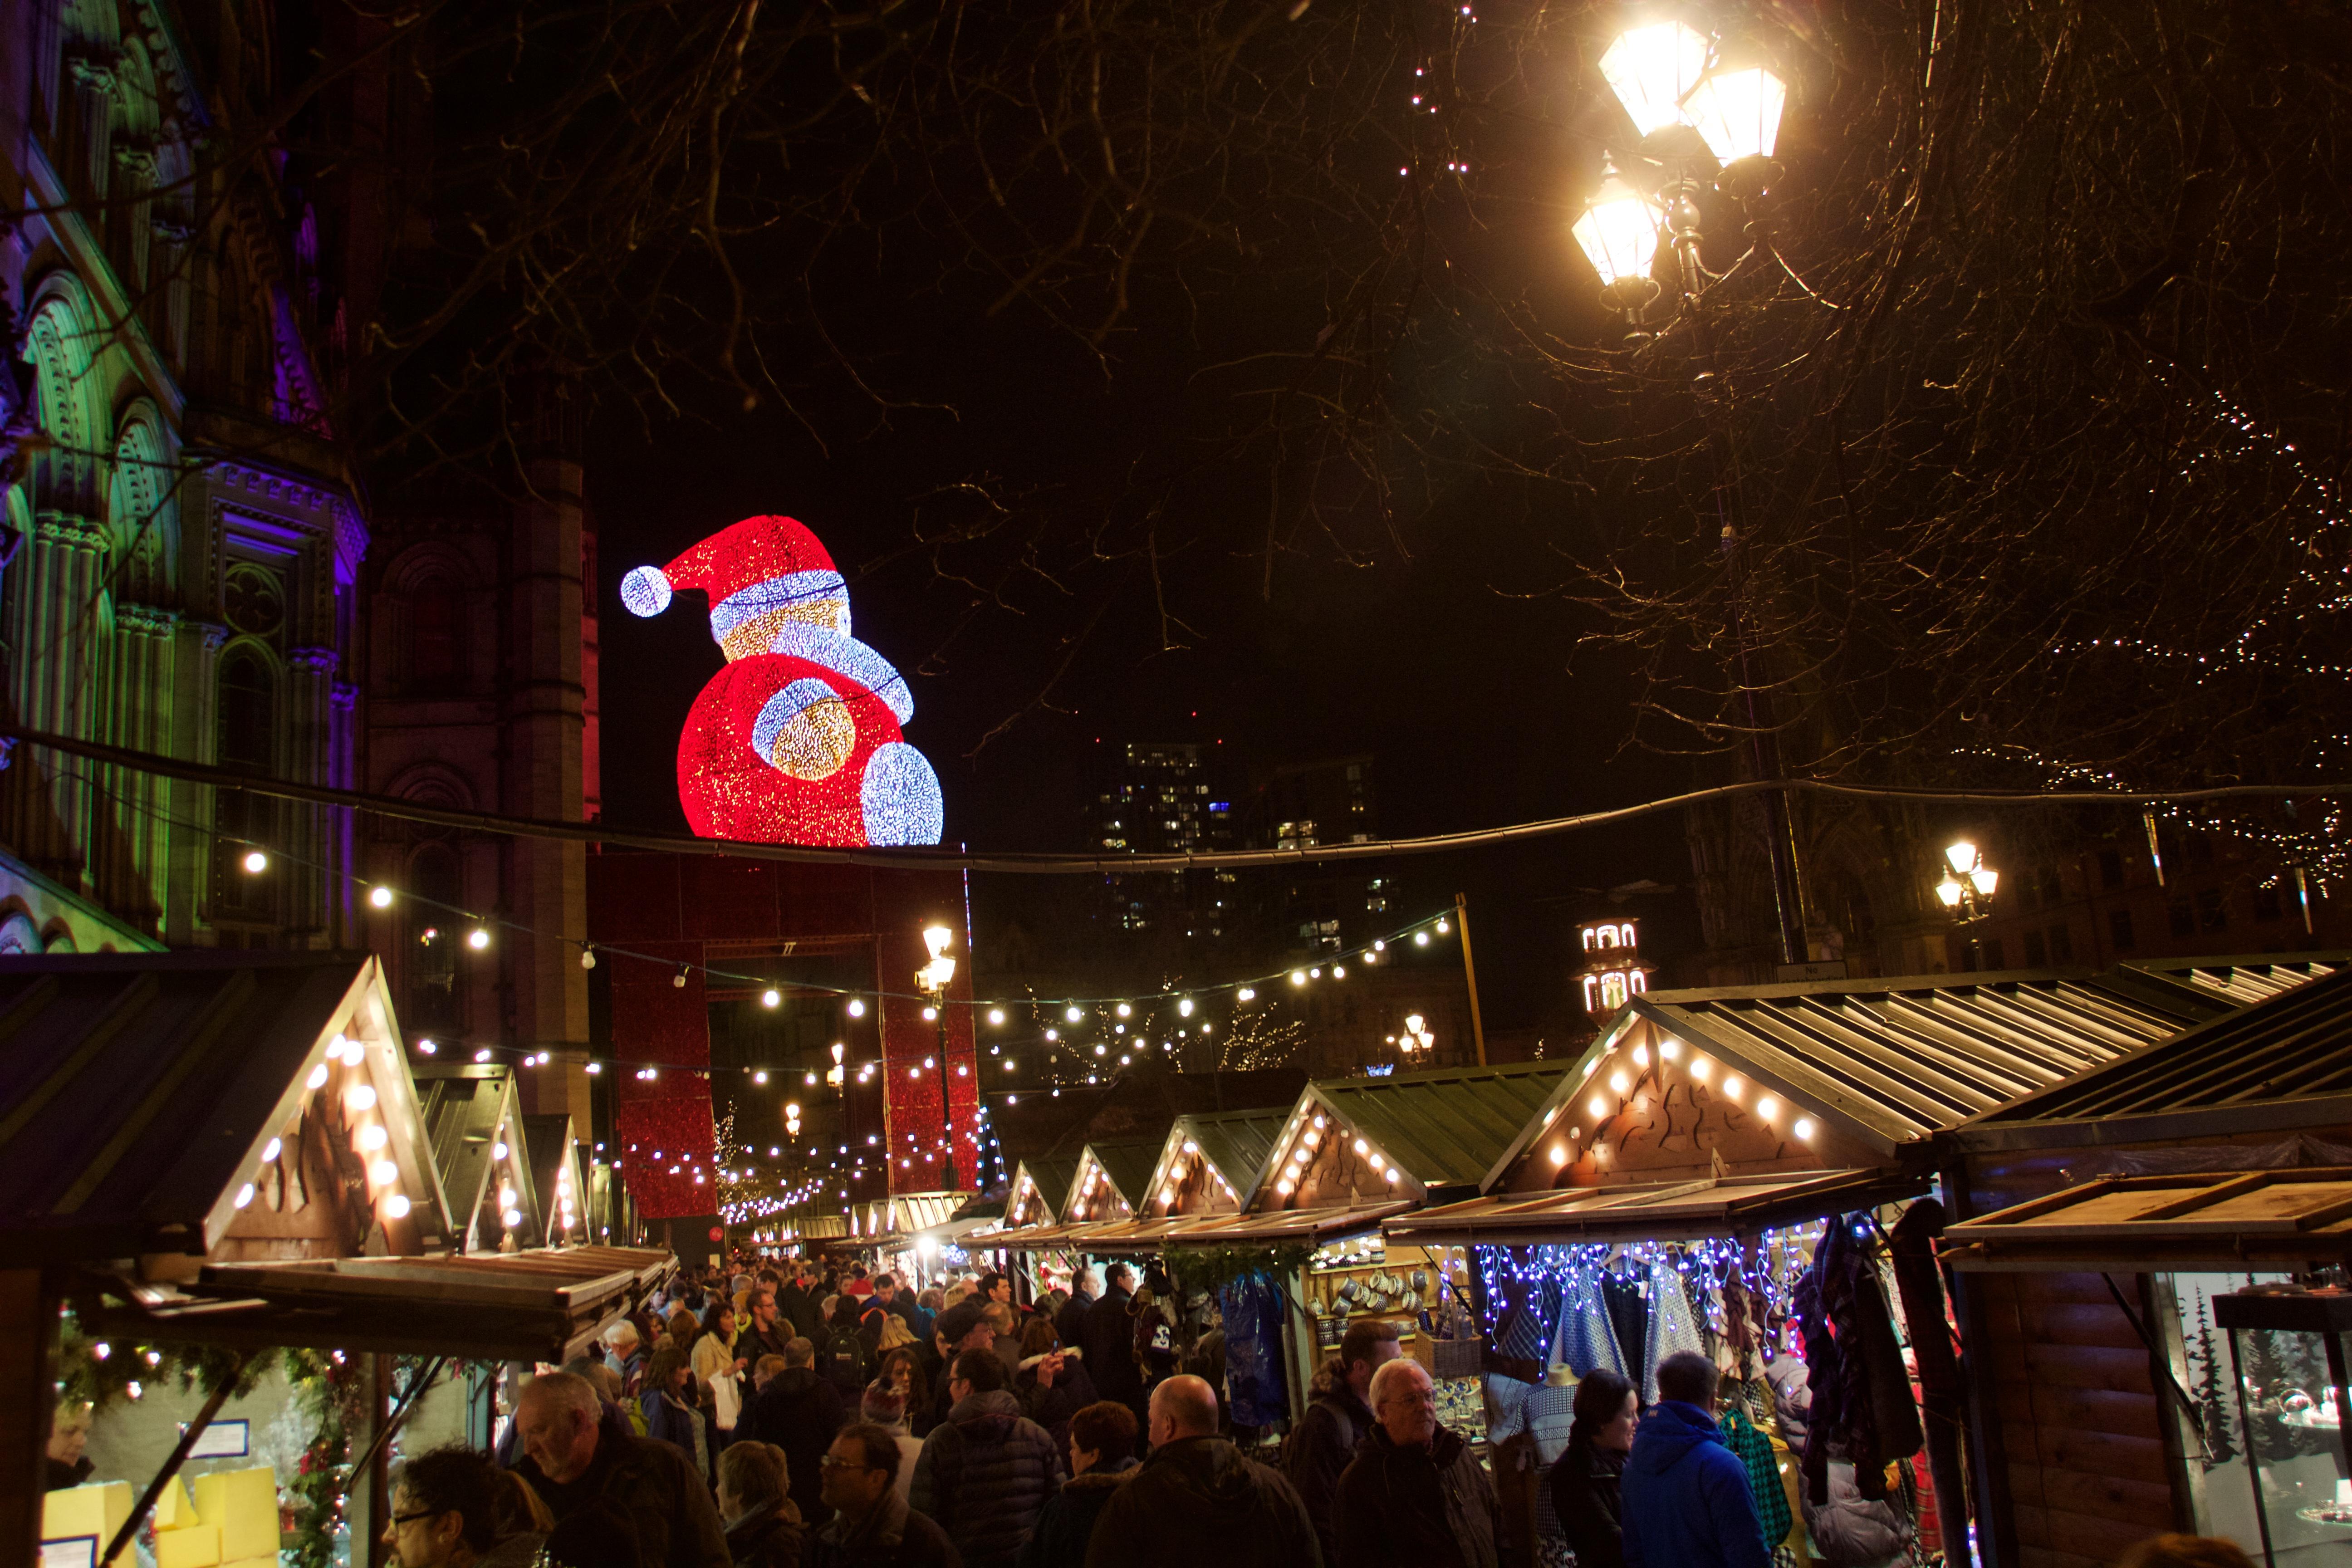 File:Manchester Christmas Markets 2015 002 jpg - Wikimedia